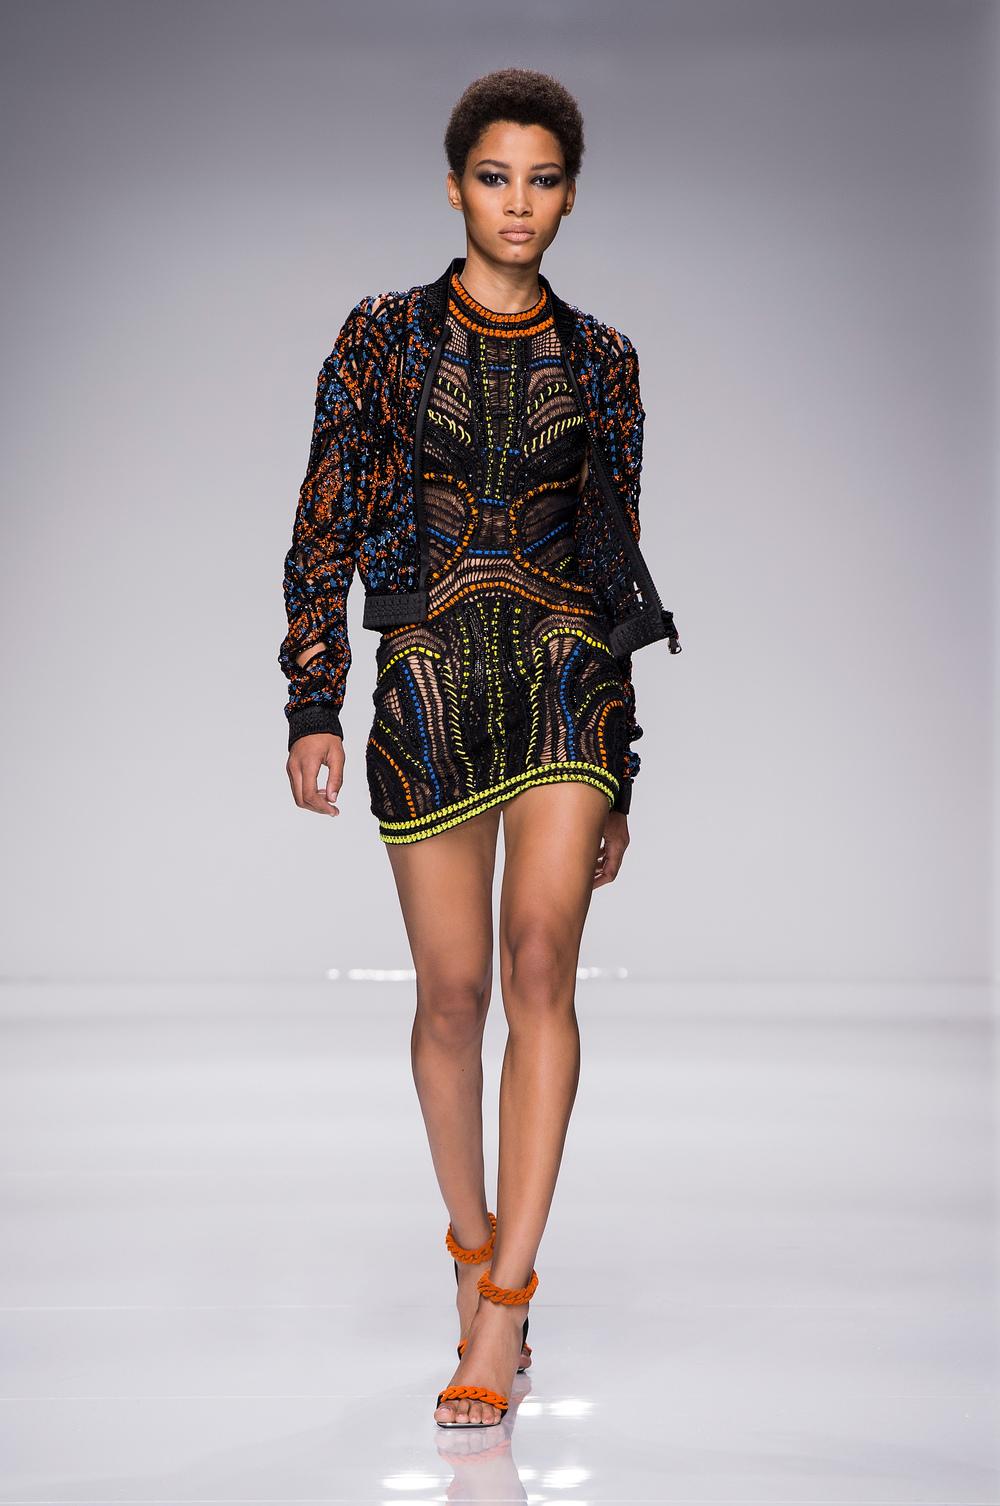 Atelier Versace SS16_Look 28.JPG